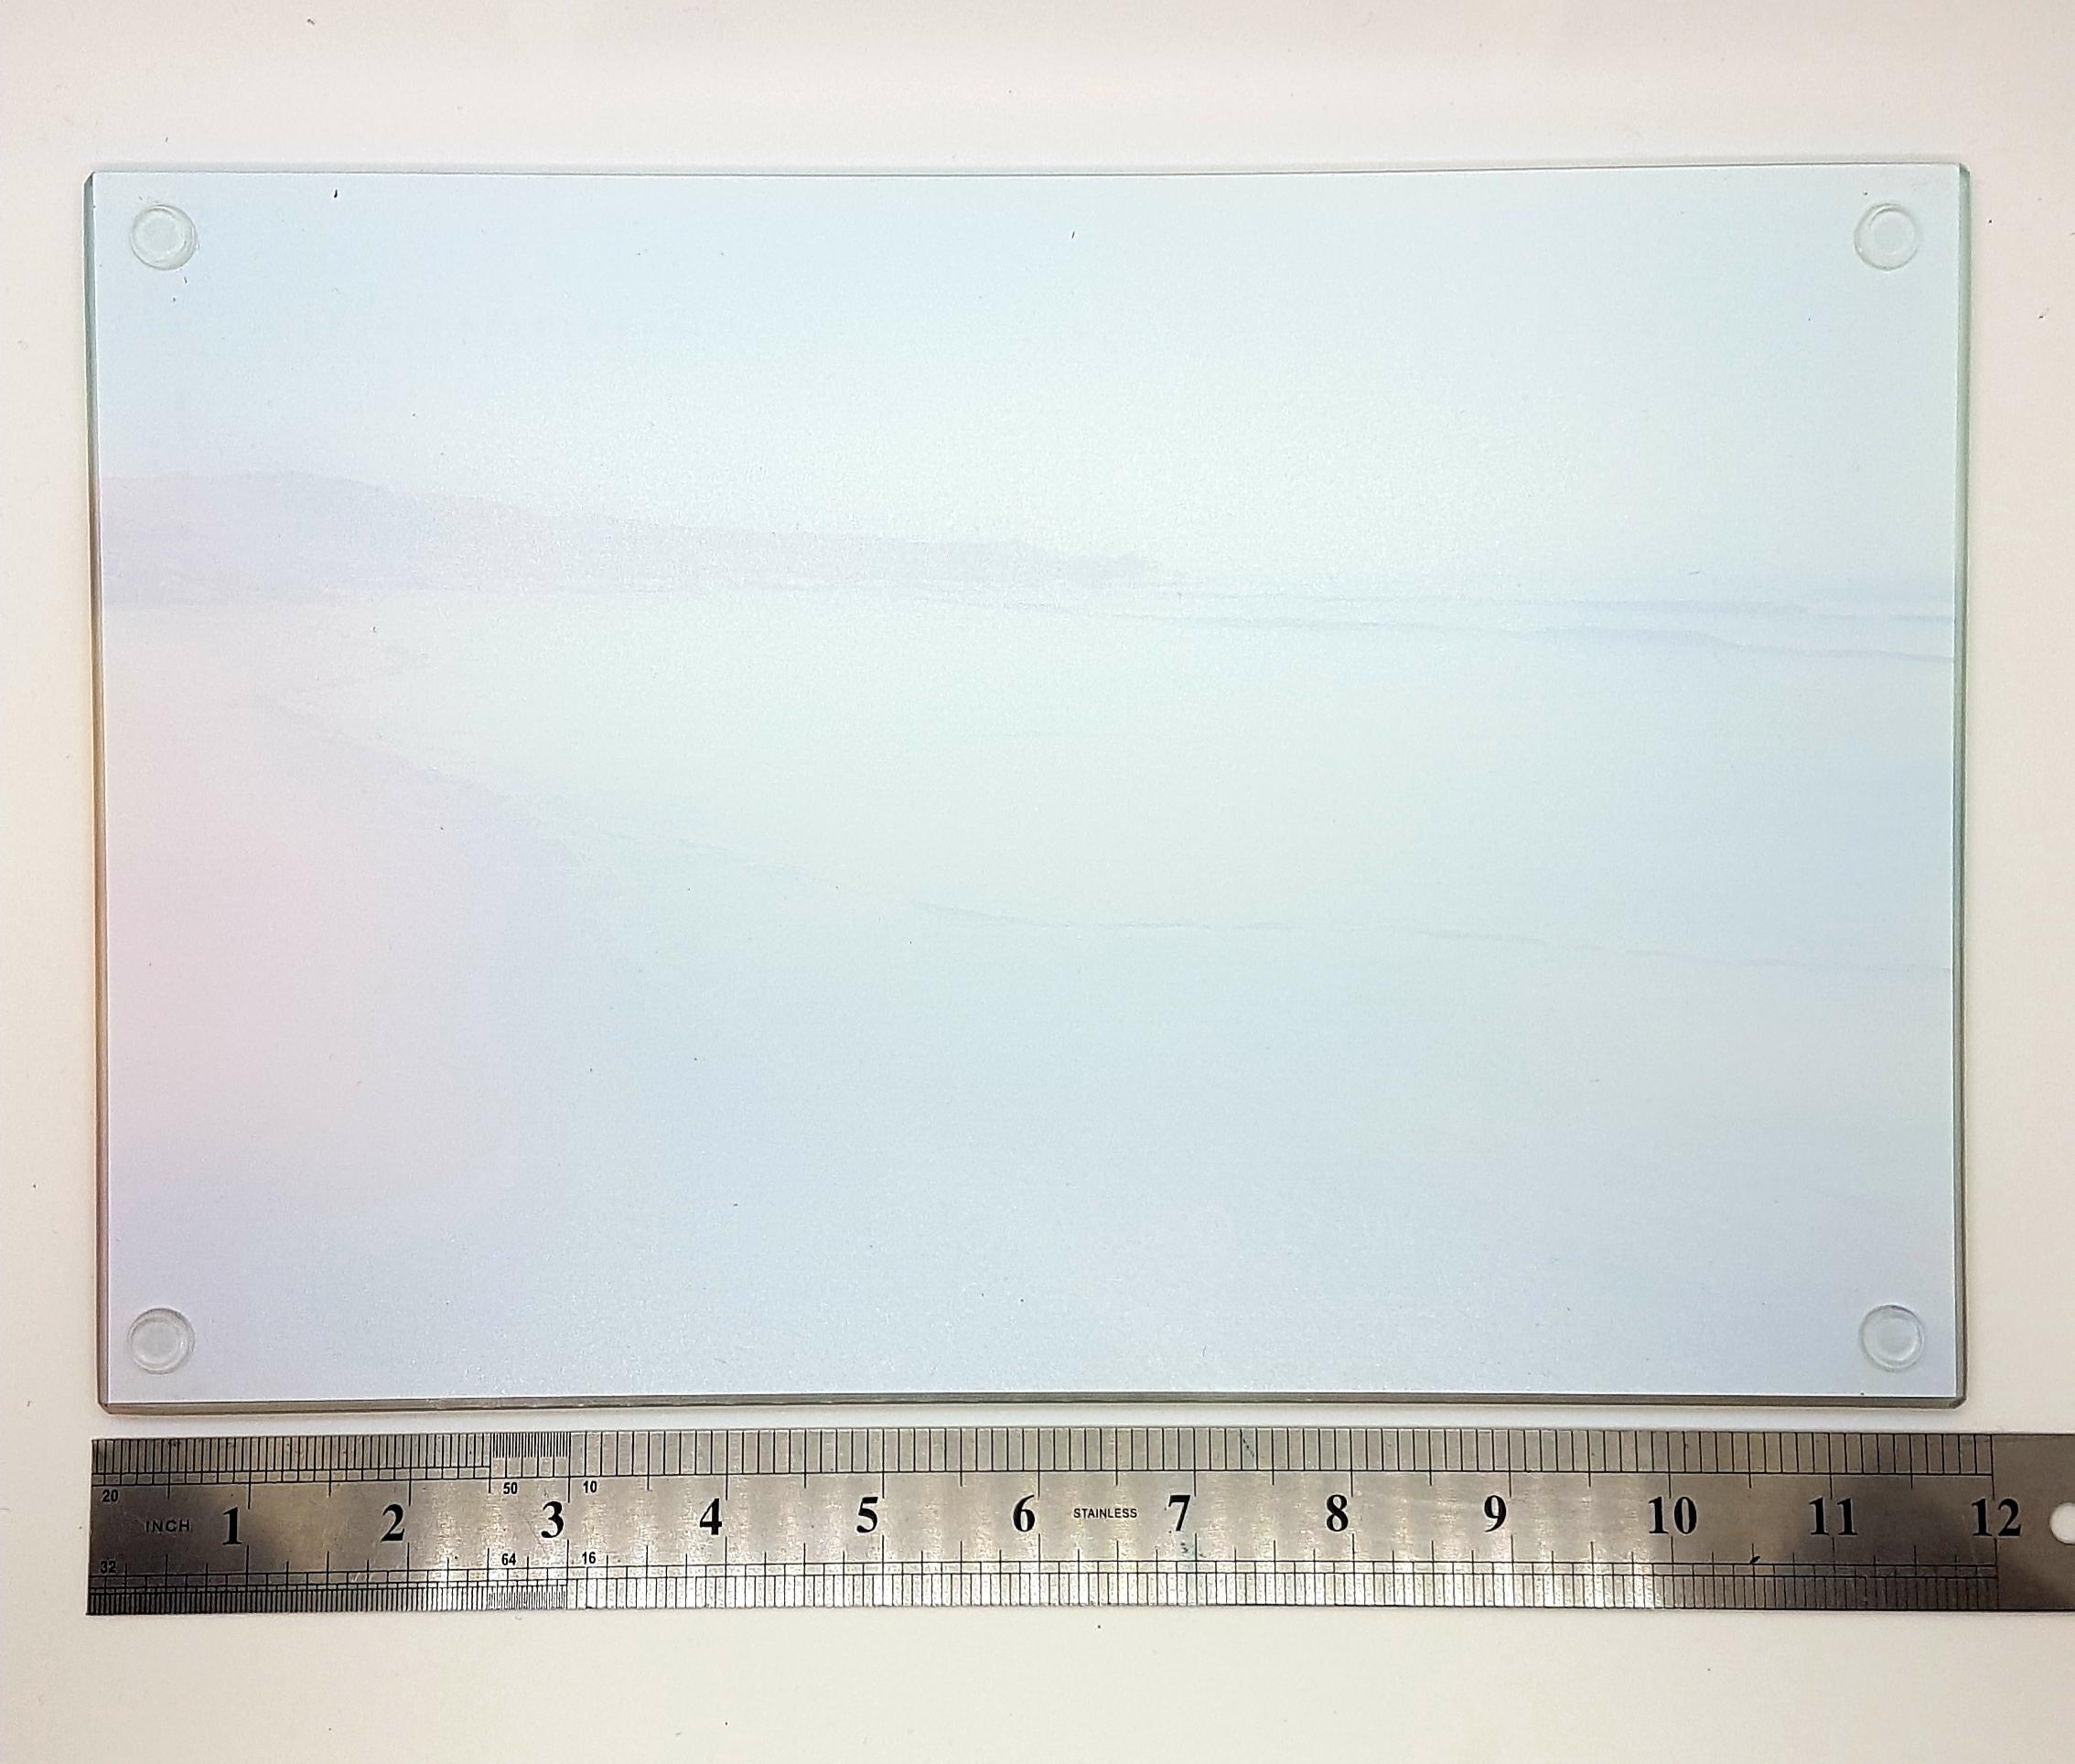 Glass worktop saver, coaster and table mat. Shoreline